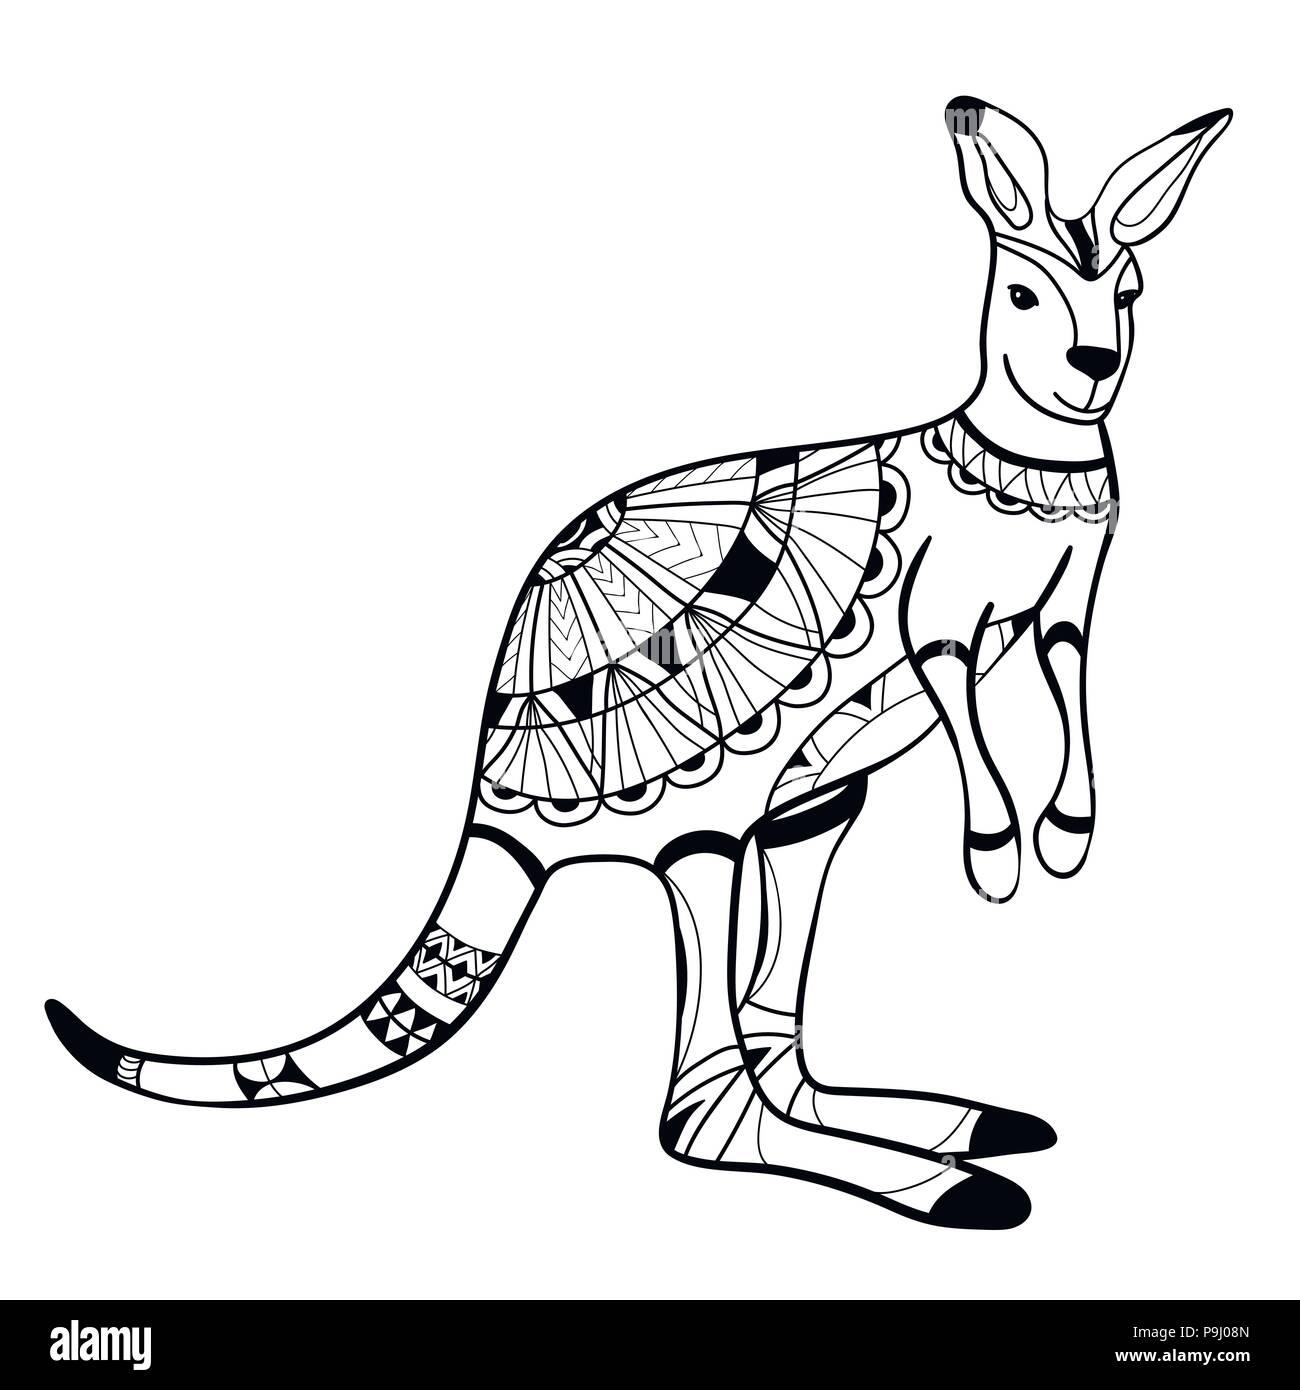 Coloriage Mandala Kangourou.Livre De Coloriage Coloriage Animal Le Kangourou Le Motif